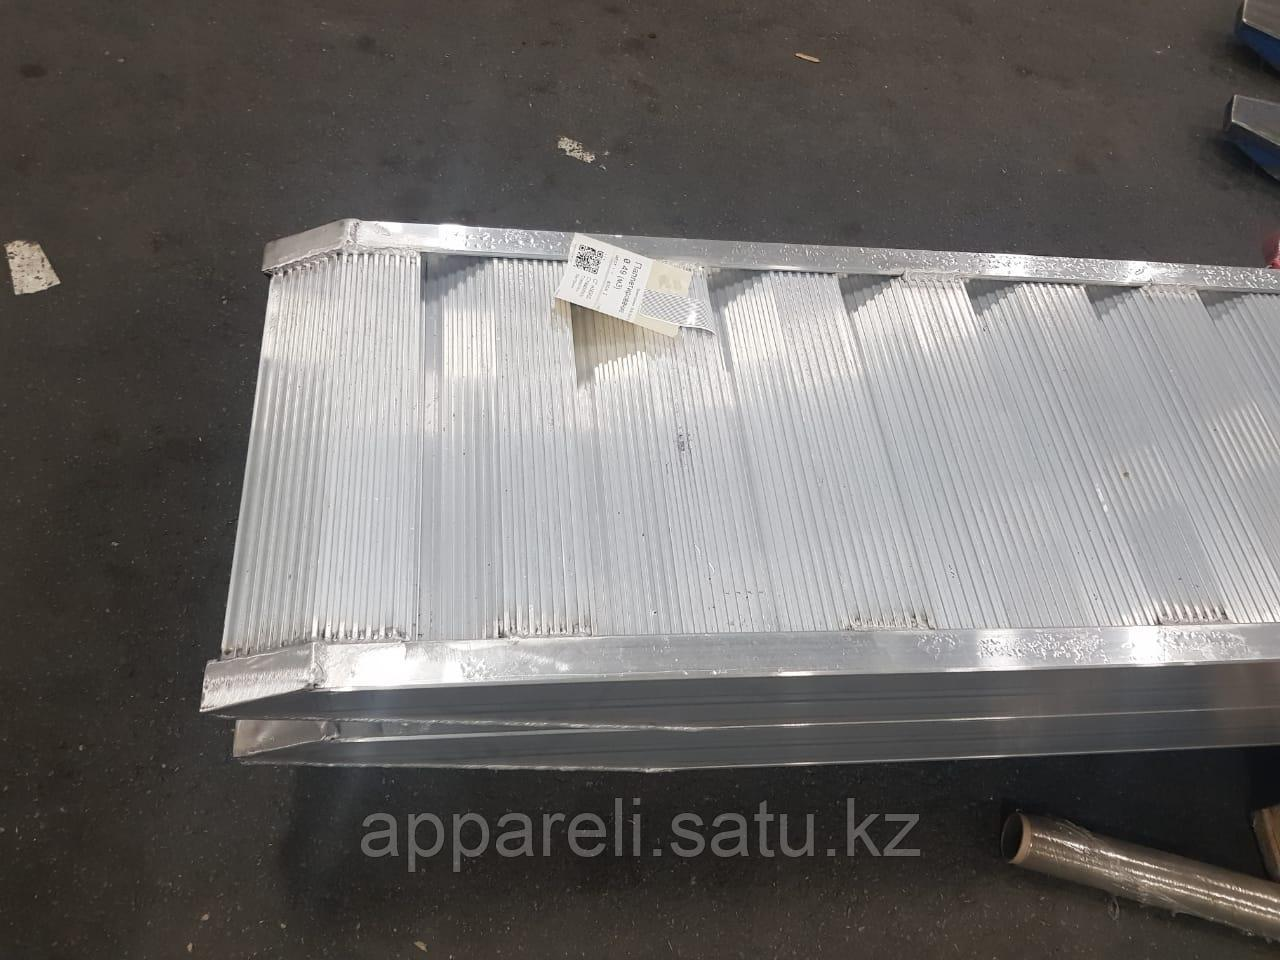 Аппарели, грузоподъёмность 8.5 тонн